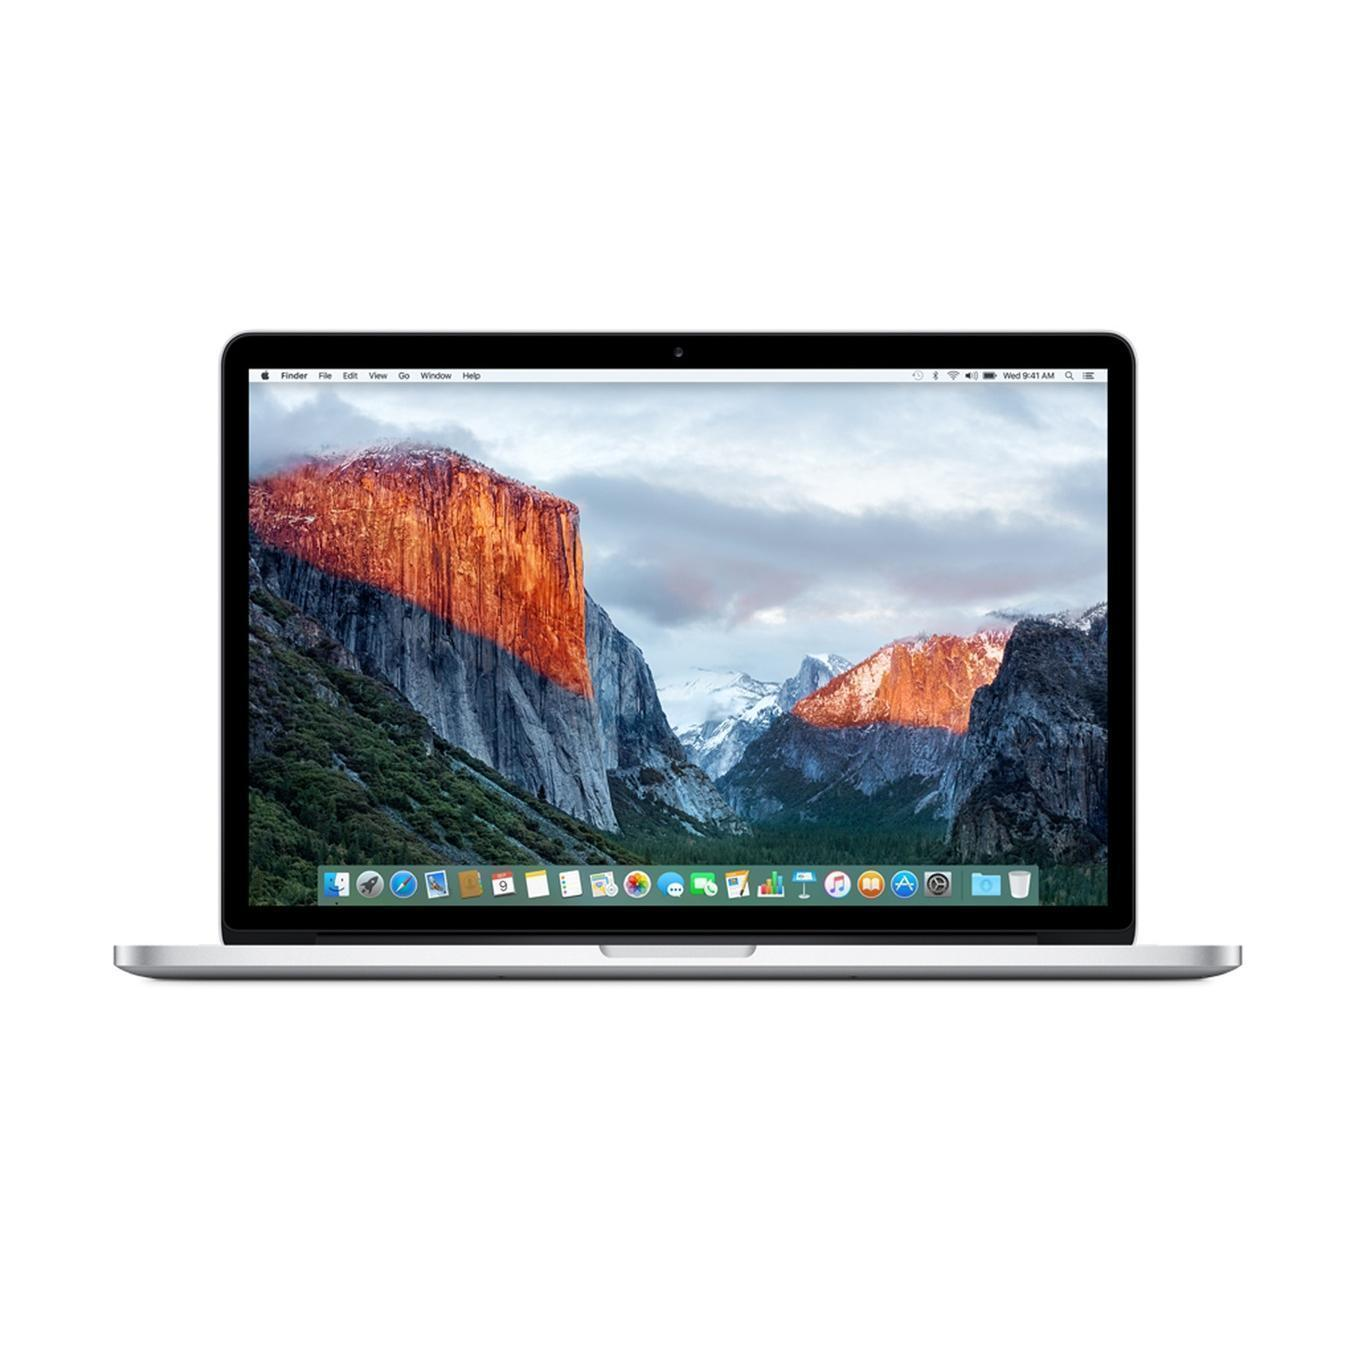 MacBook Pro Retina 15,4-tum (2013) - Core i7 - 8GB - SSD 1000 GB AZERTY - Fransk